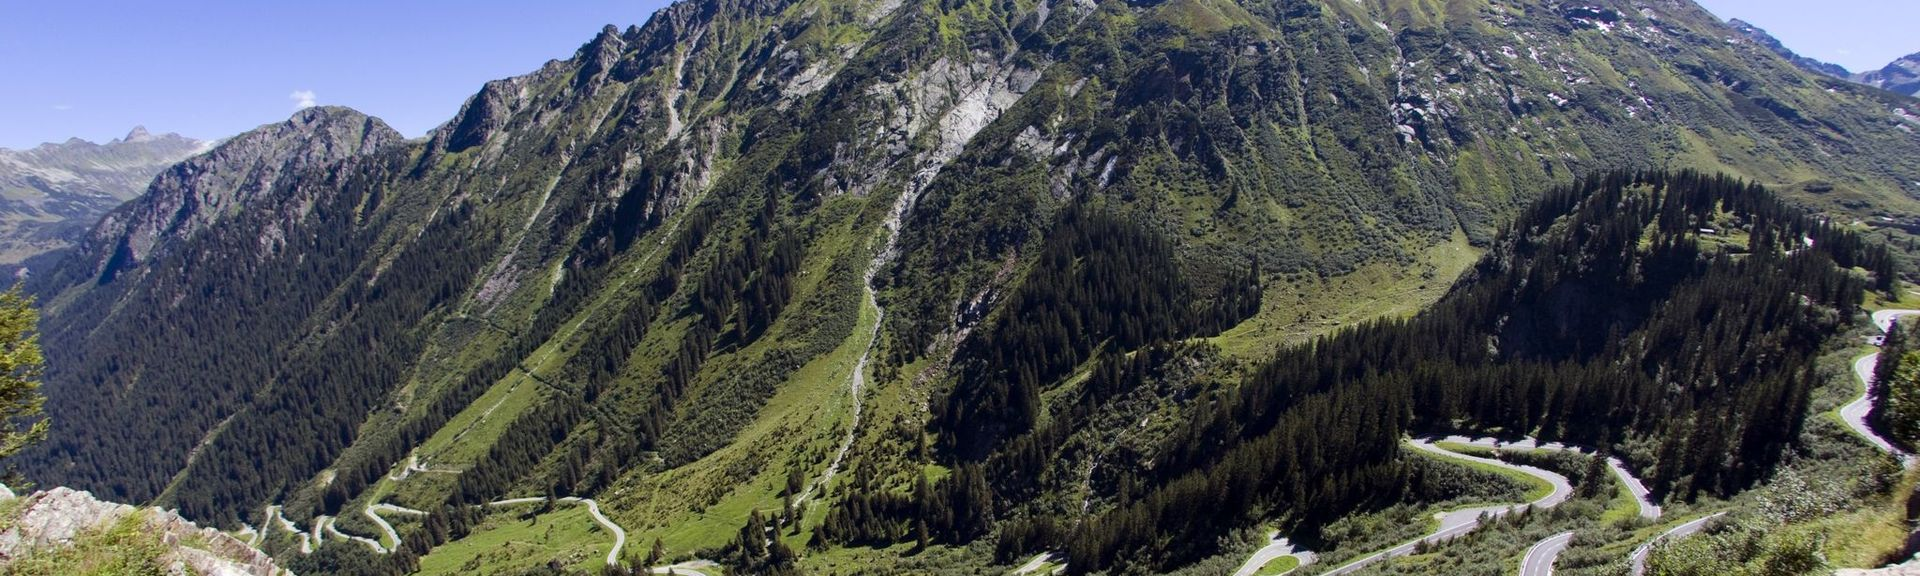 Großes Walsertal, Ludesch, Vorarlberg, Østrig